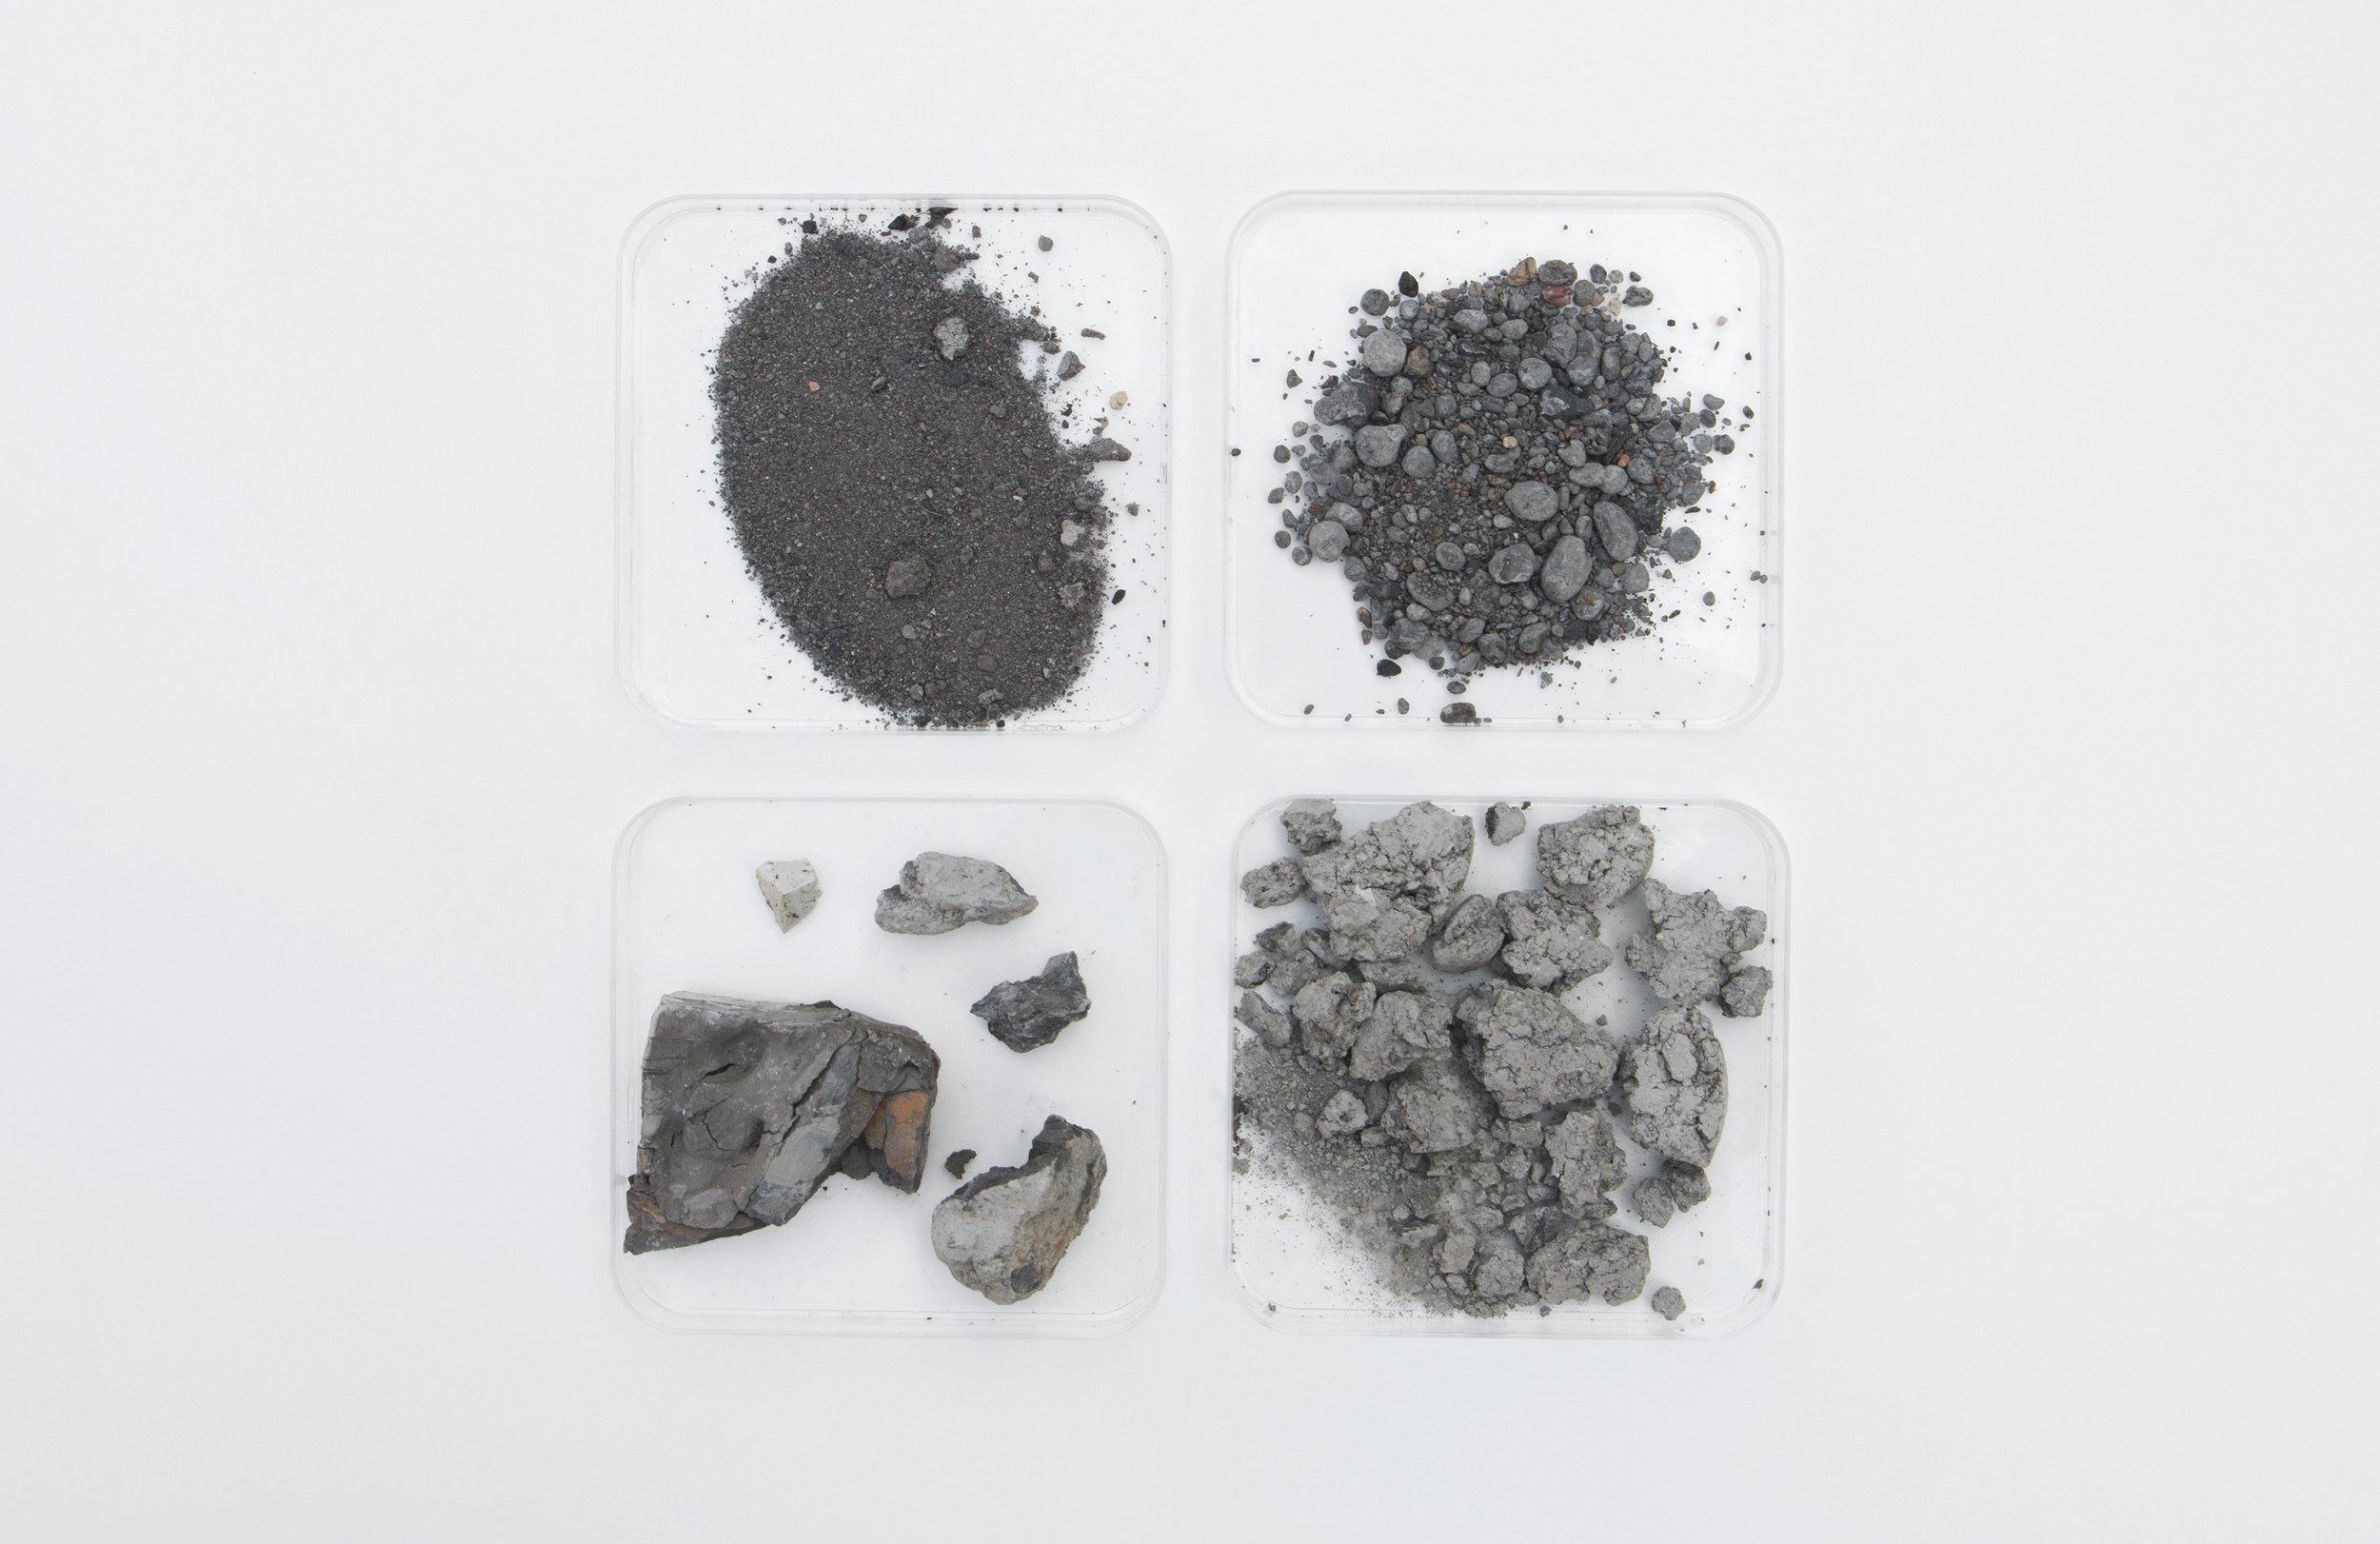 carly_ceramics_materials_1.jpg